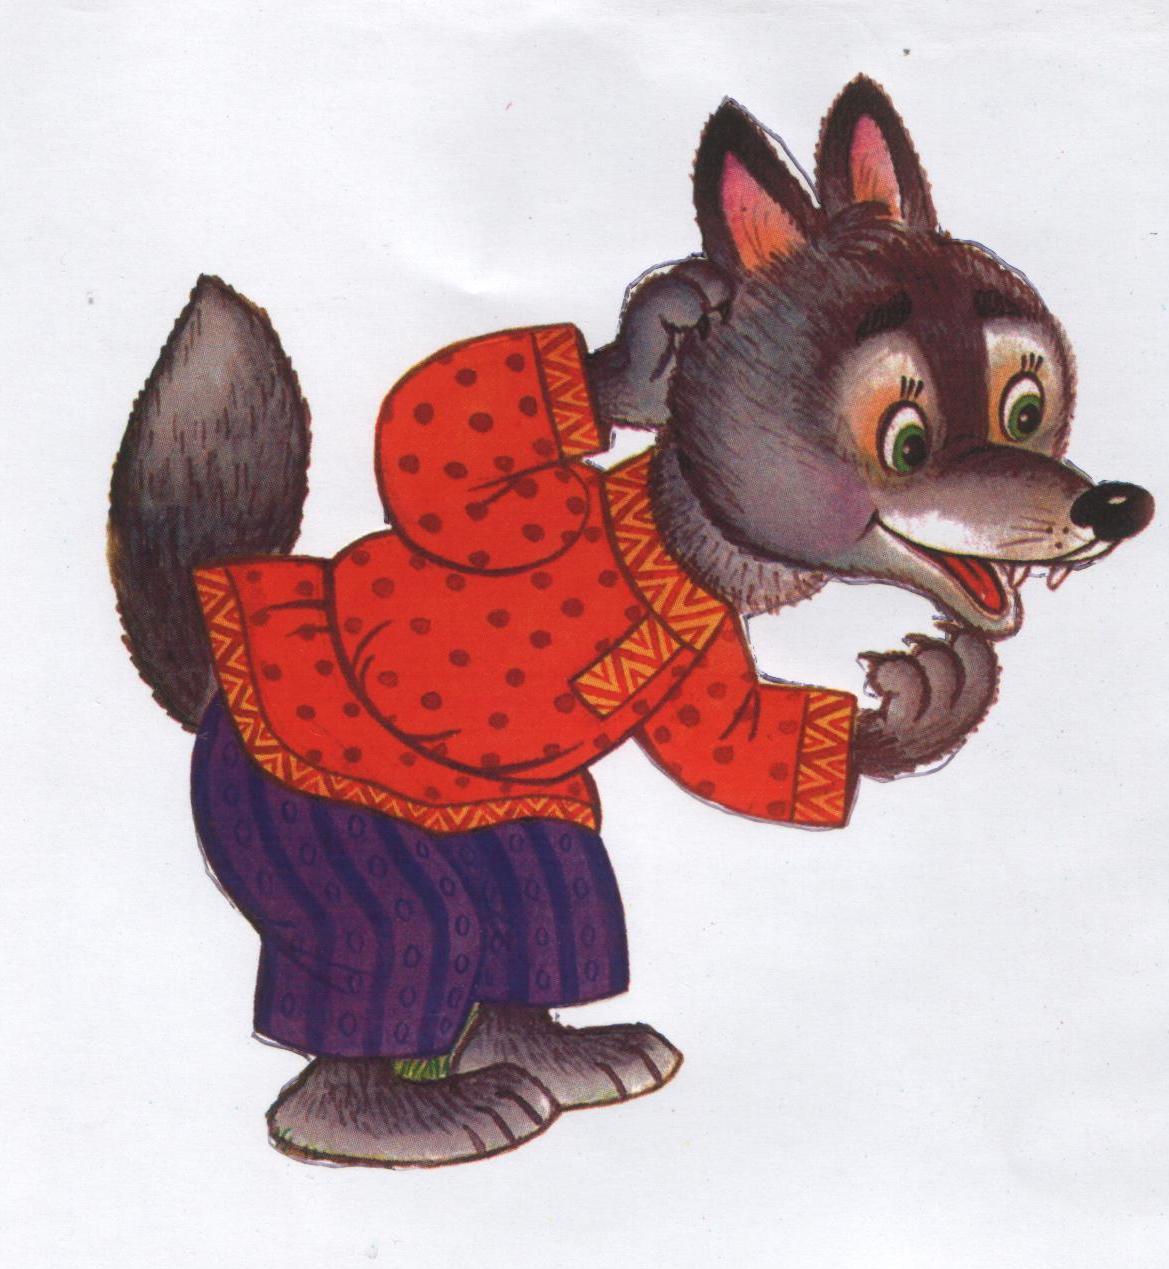 картинка волка из сказки рукавичка всего